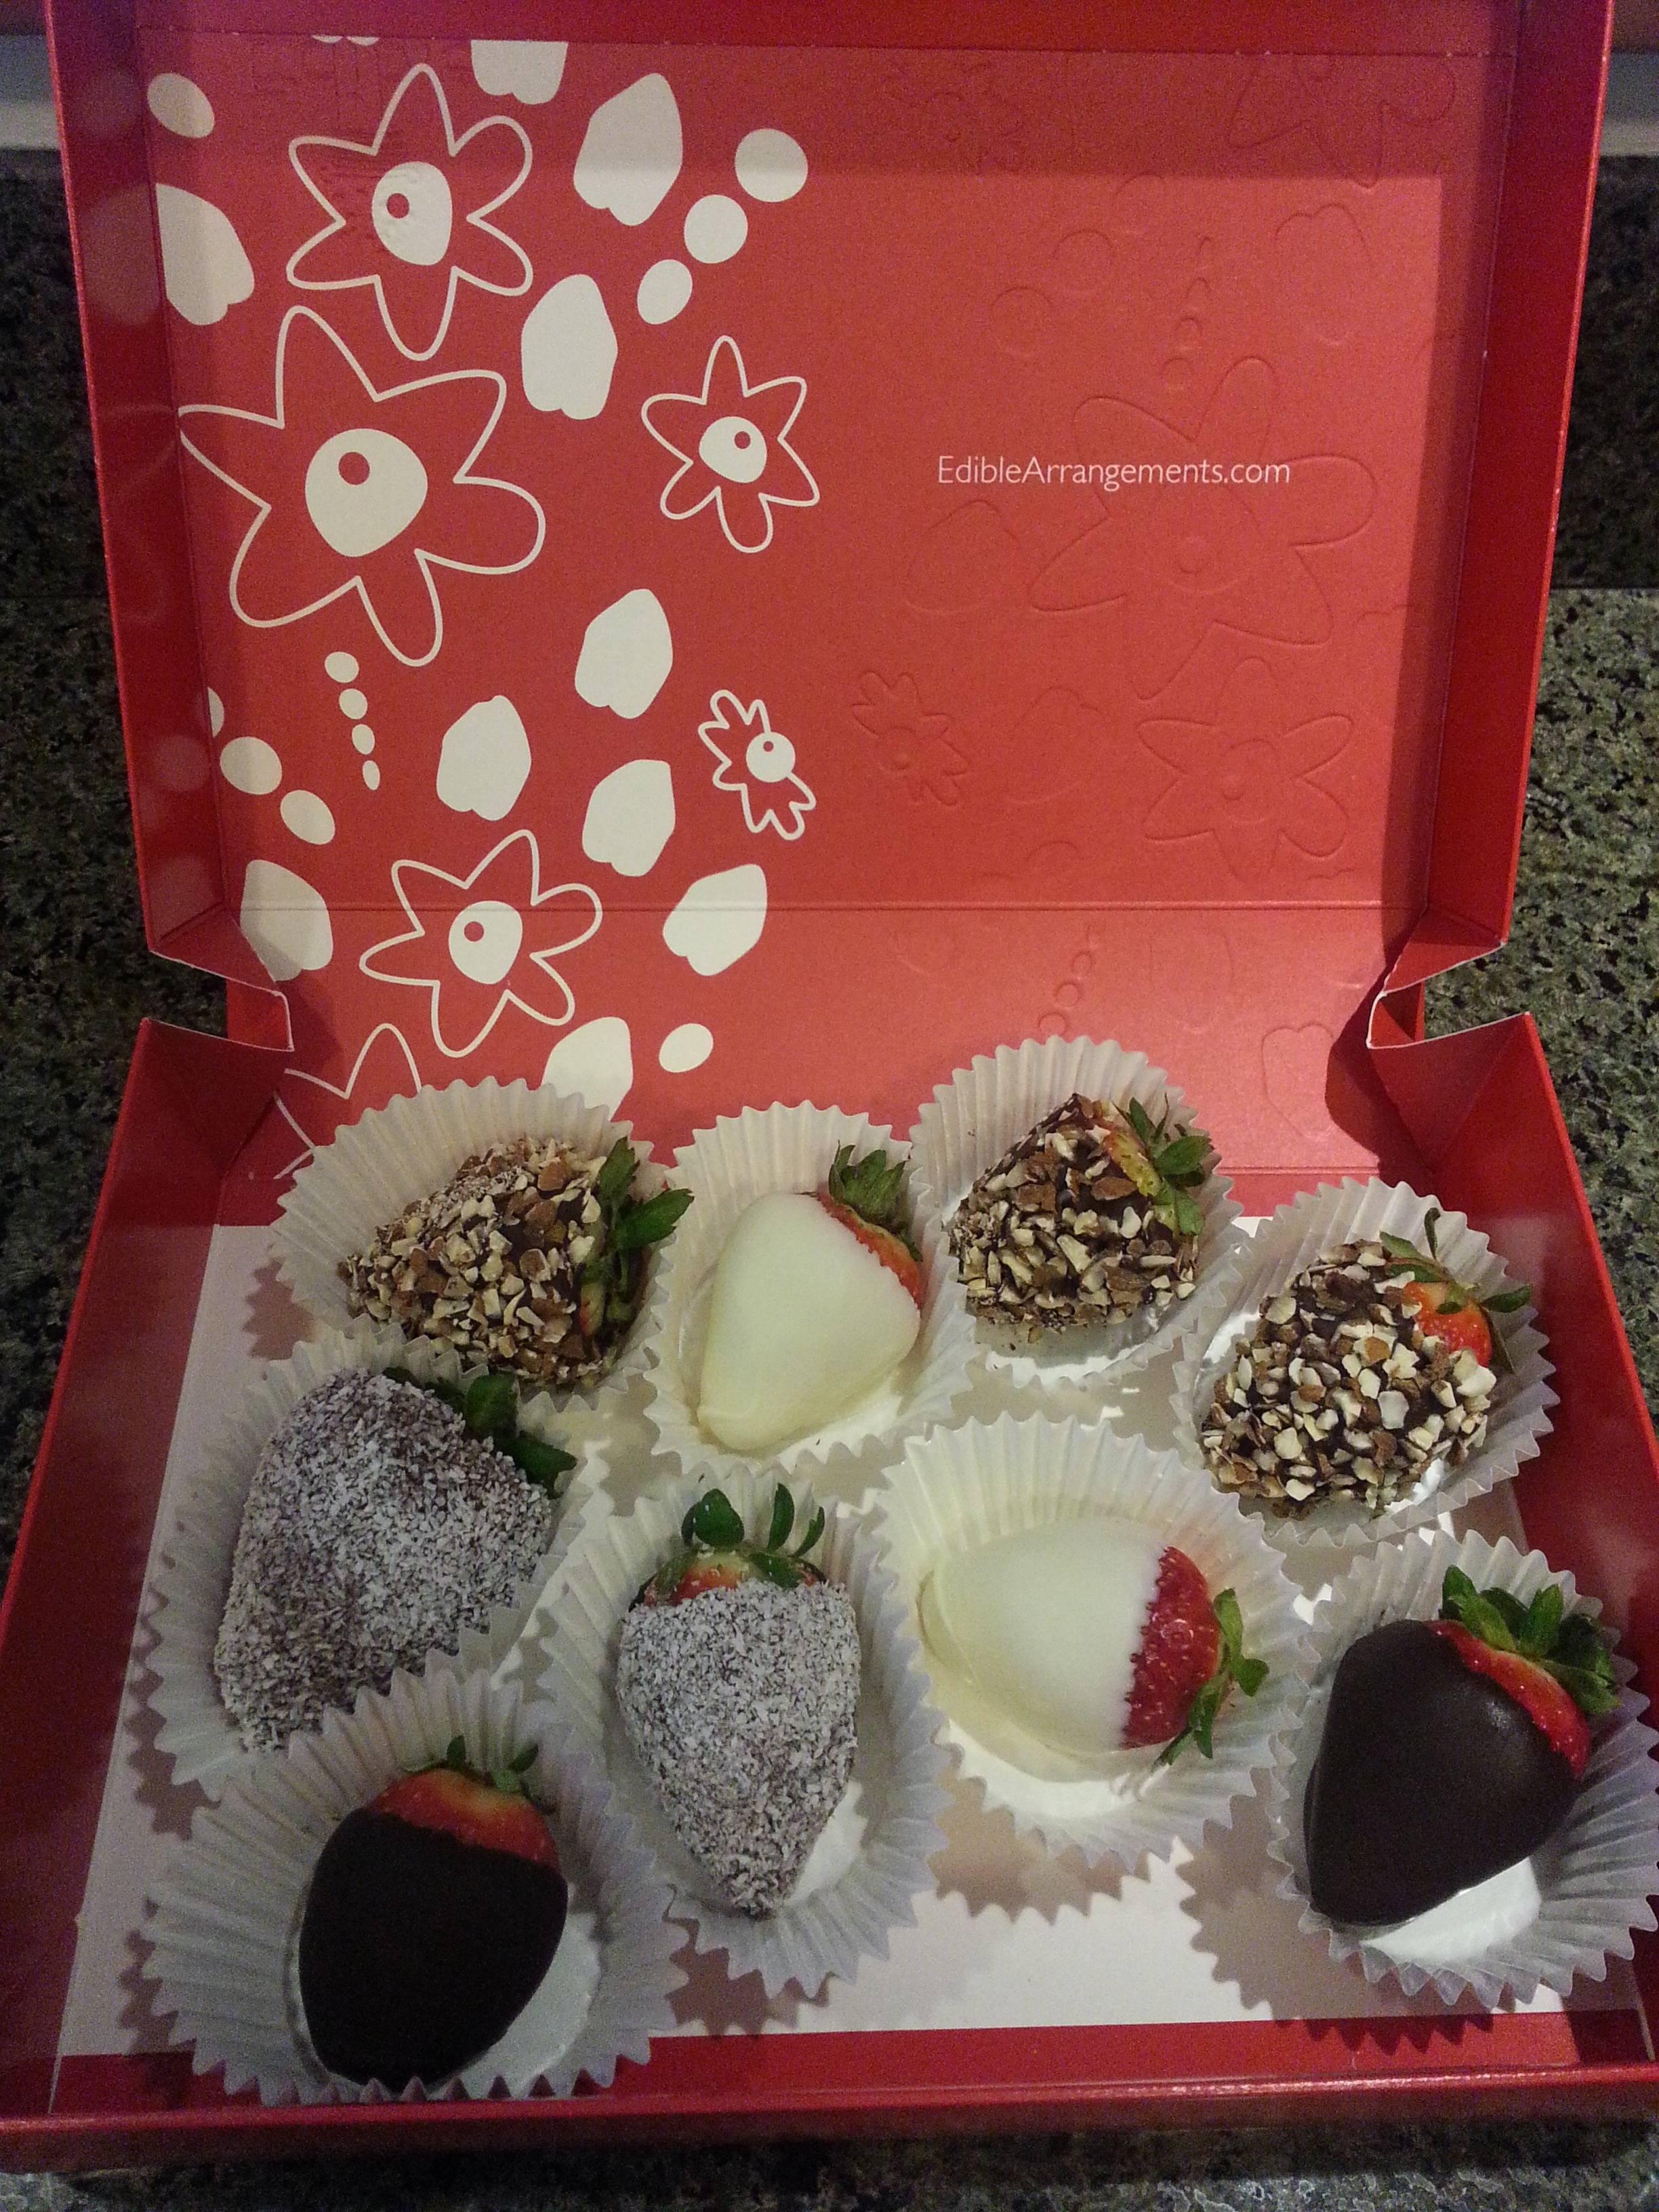 Chocolate Covered Strawberries Edible Arrangements - Pumpkin ...